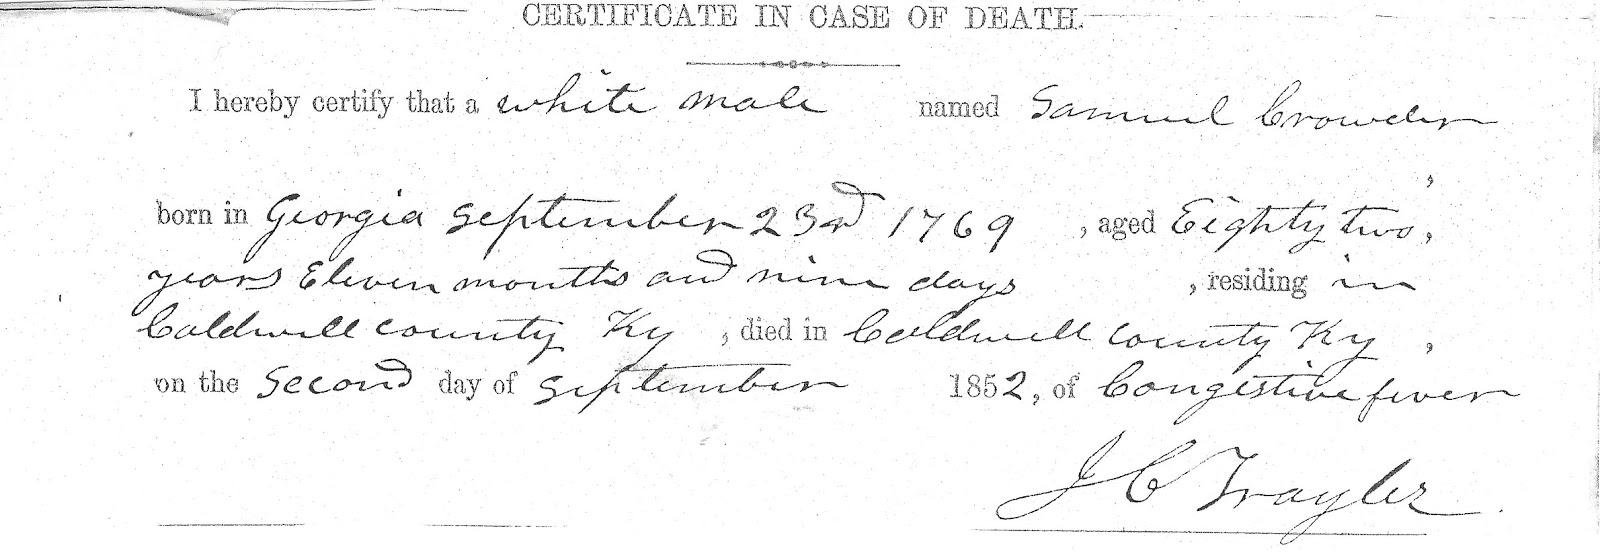 Western Kentucky Genealogy Blog Kentucky Vital Statistics Law Of 1852